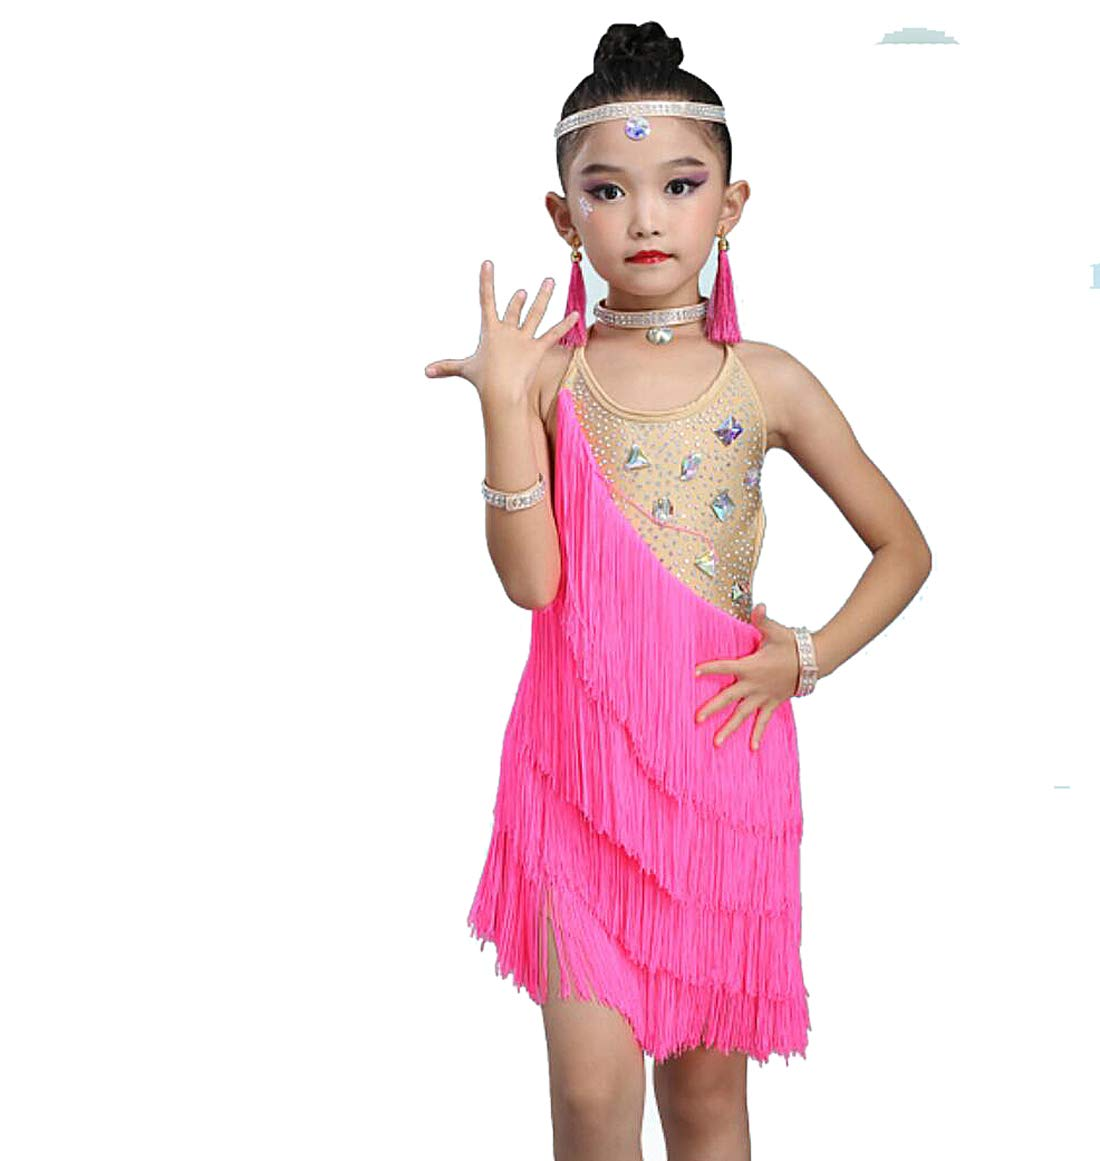 SMACO Niño Trajes de Baile Latino, niños niñas con ...